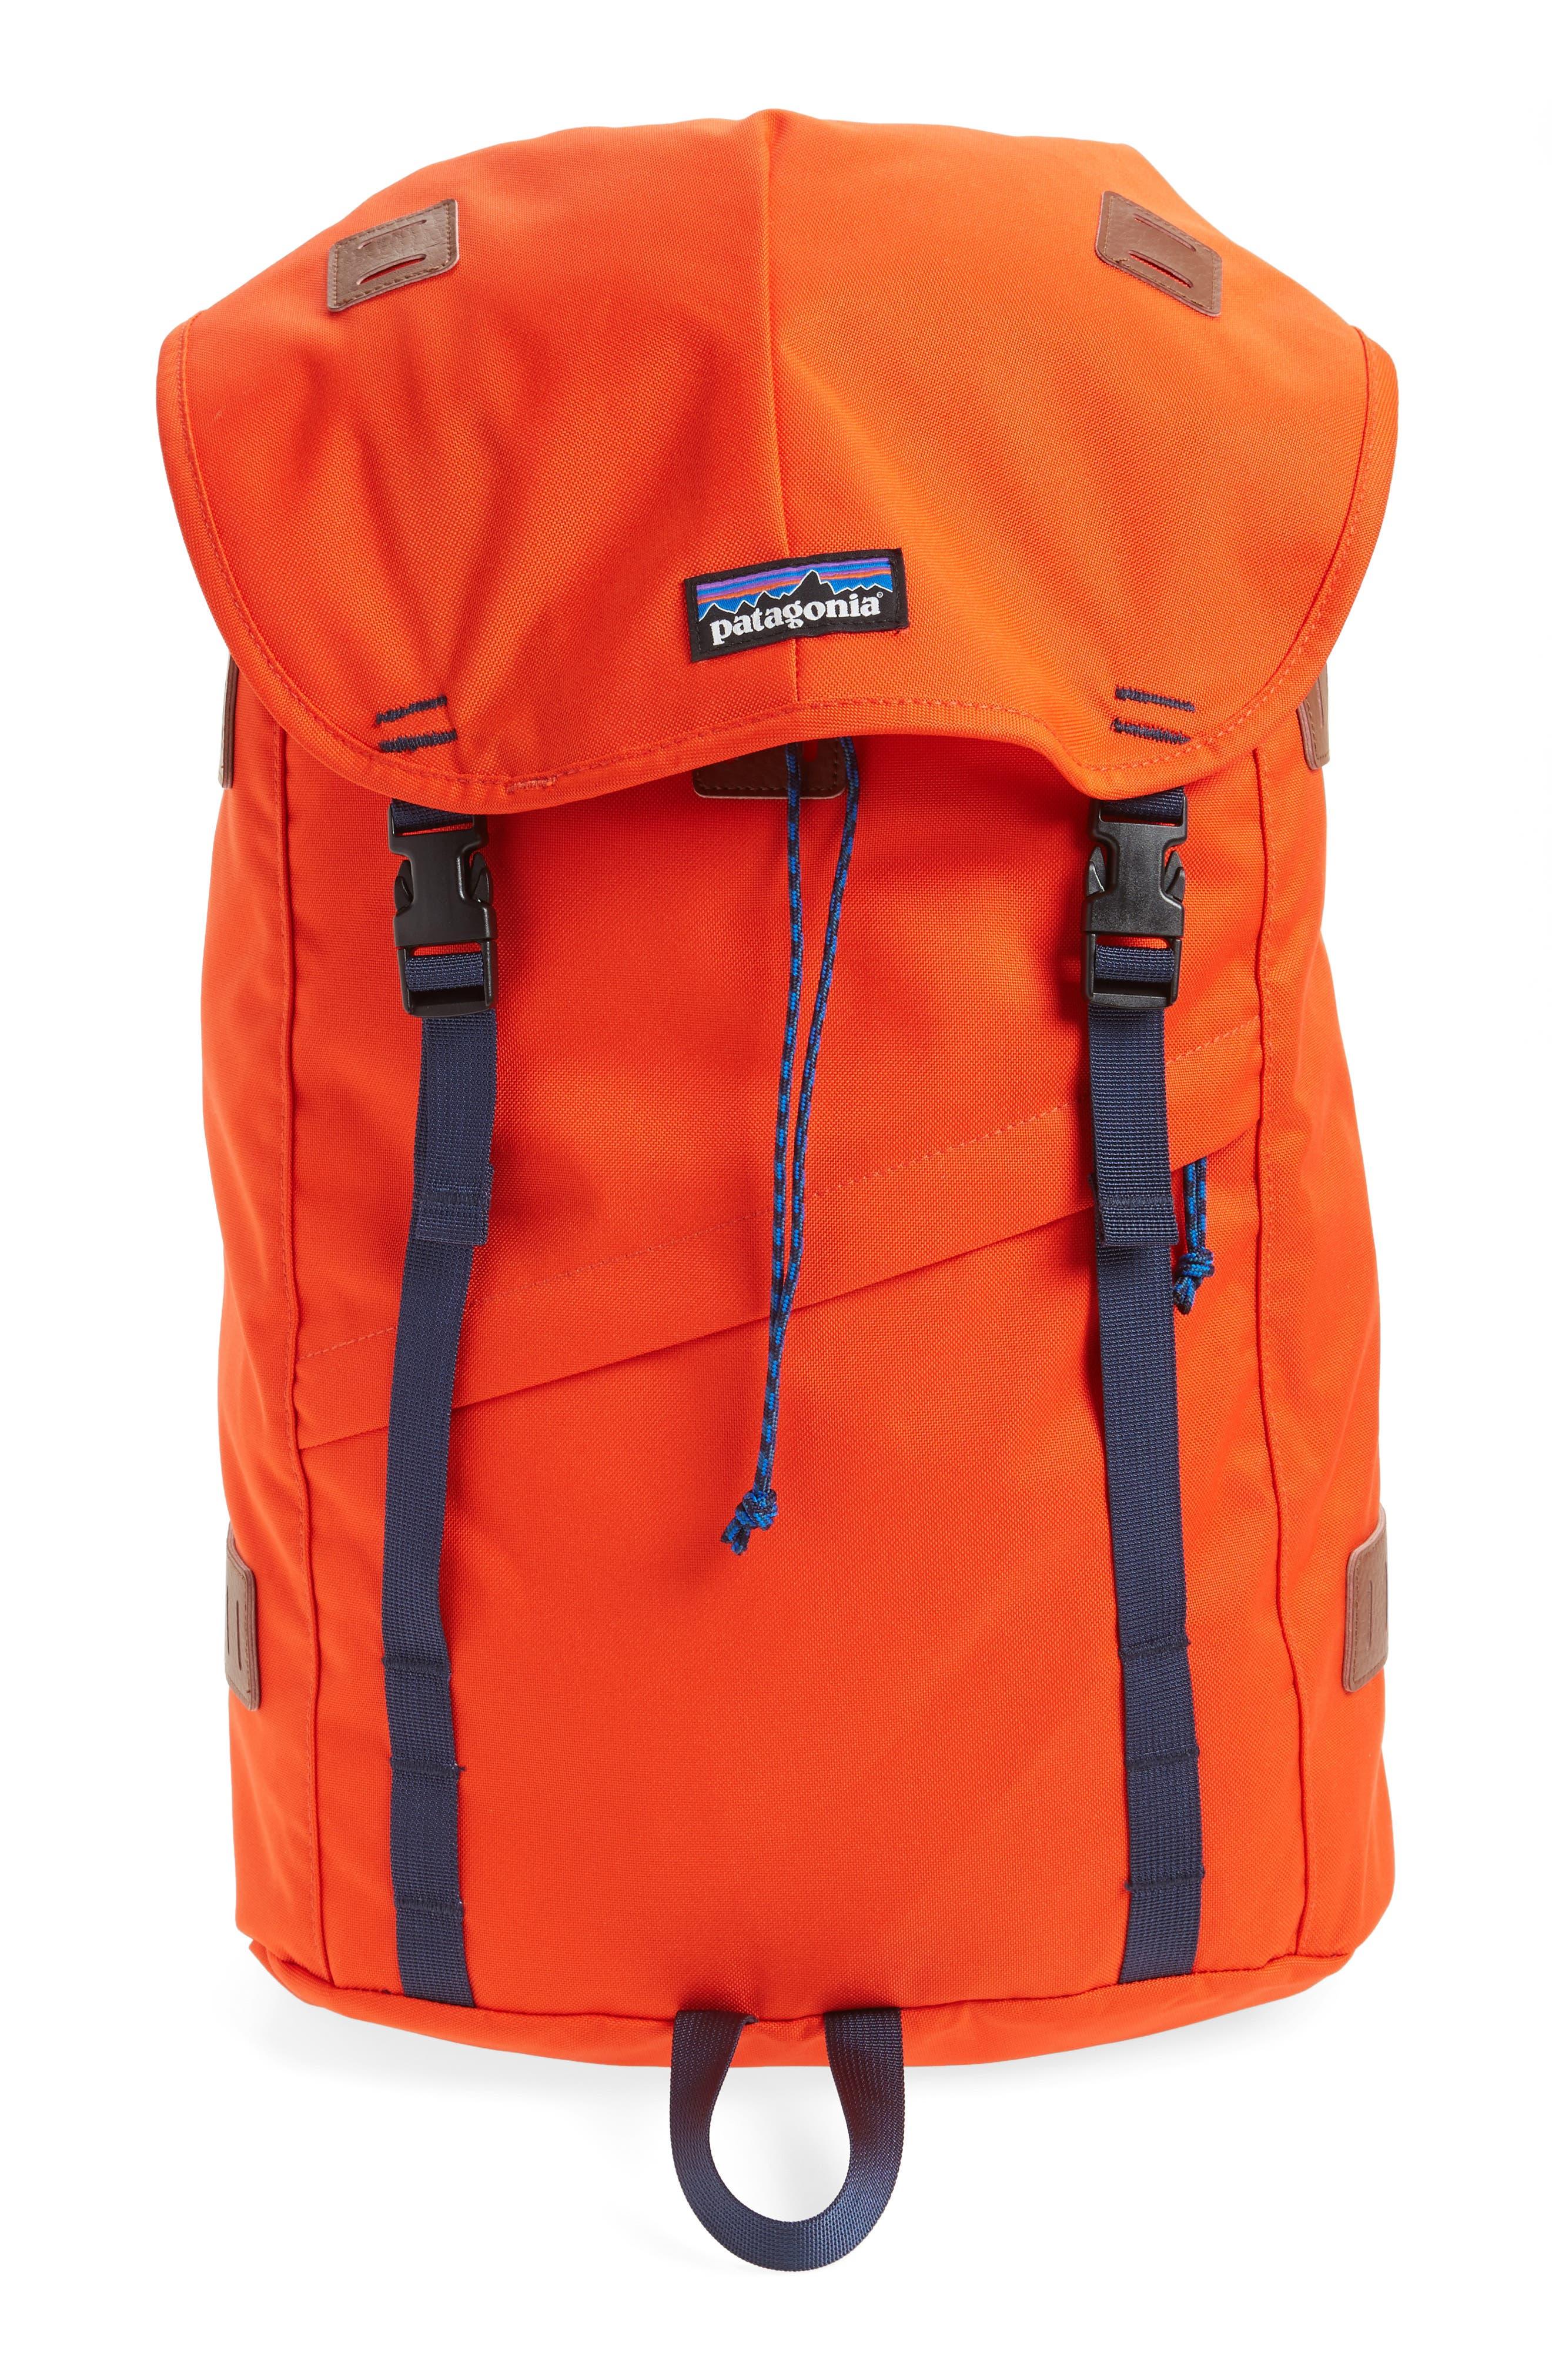 Patagonia Arbor 26-Liter Backpack